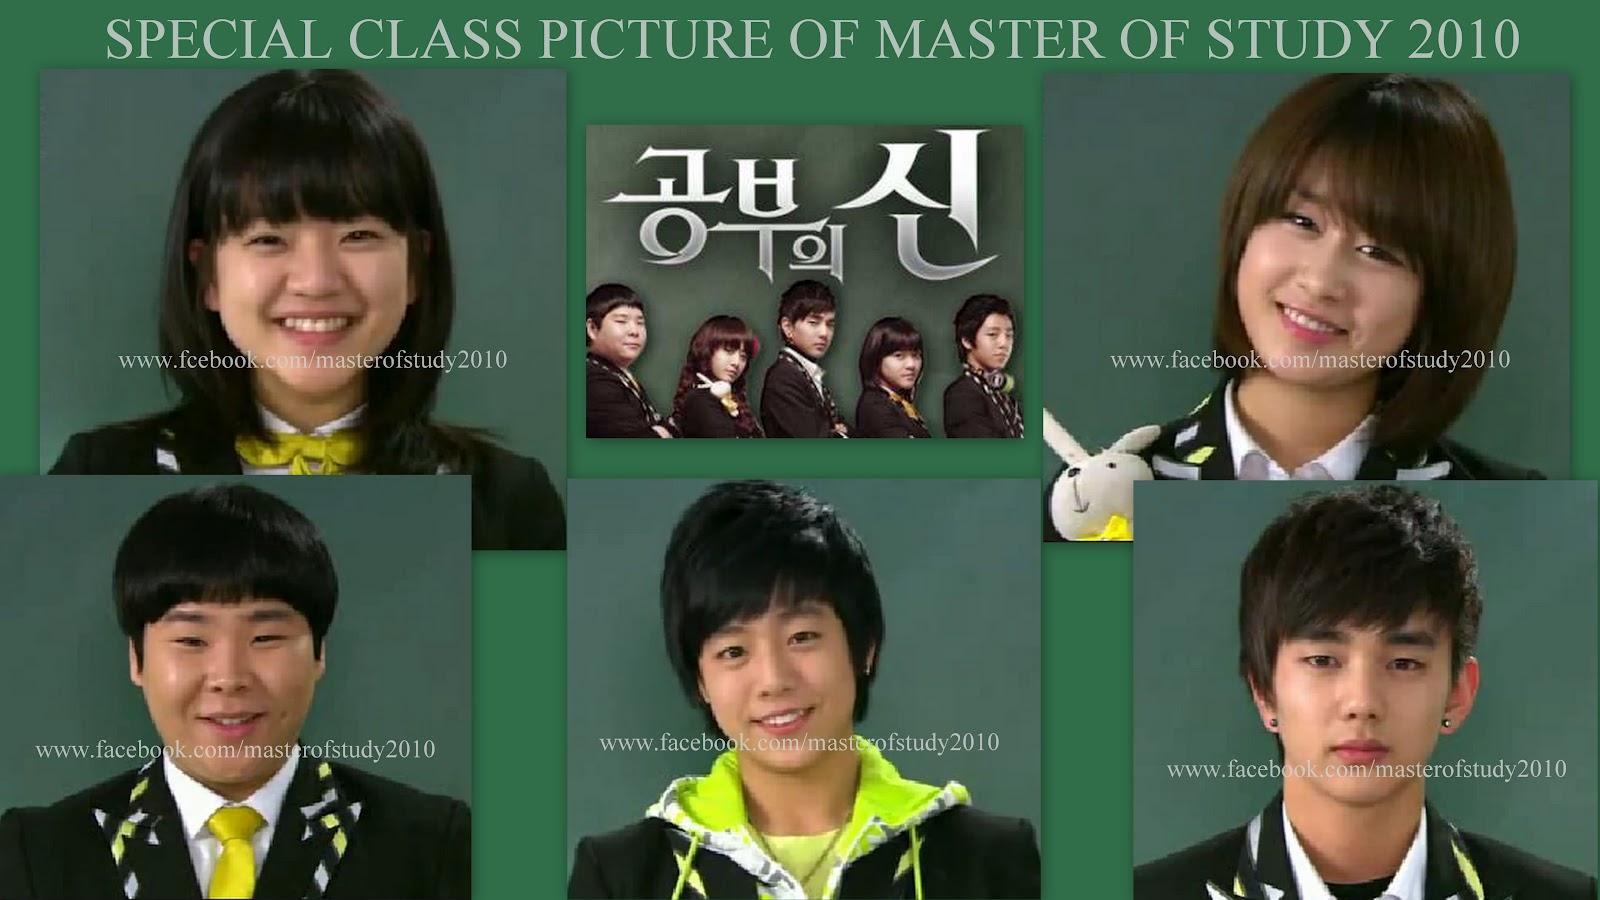 Master of Study Photos